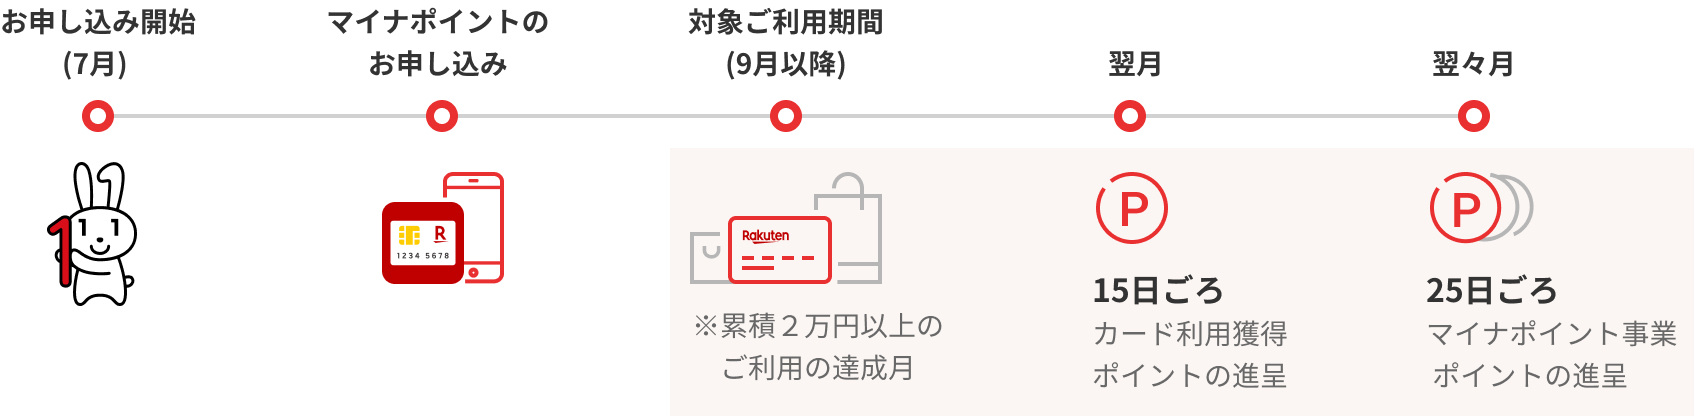 https://image.card.jp.rakuten-static.com/r-enavi/WebImages/enavi/mynumber/mynumber-flow.jpg